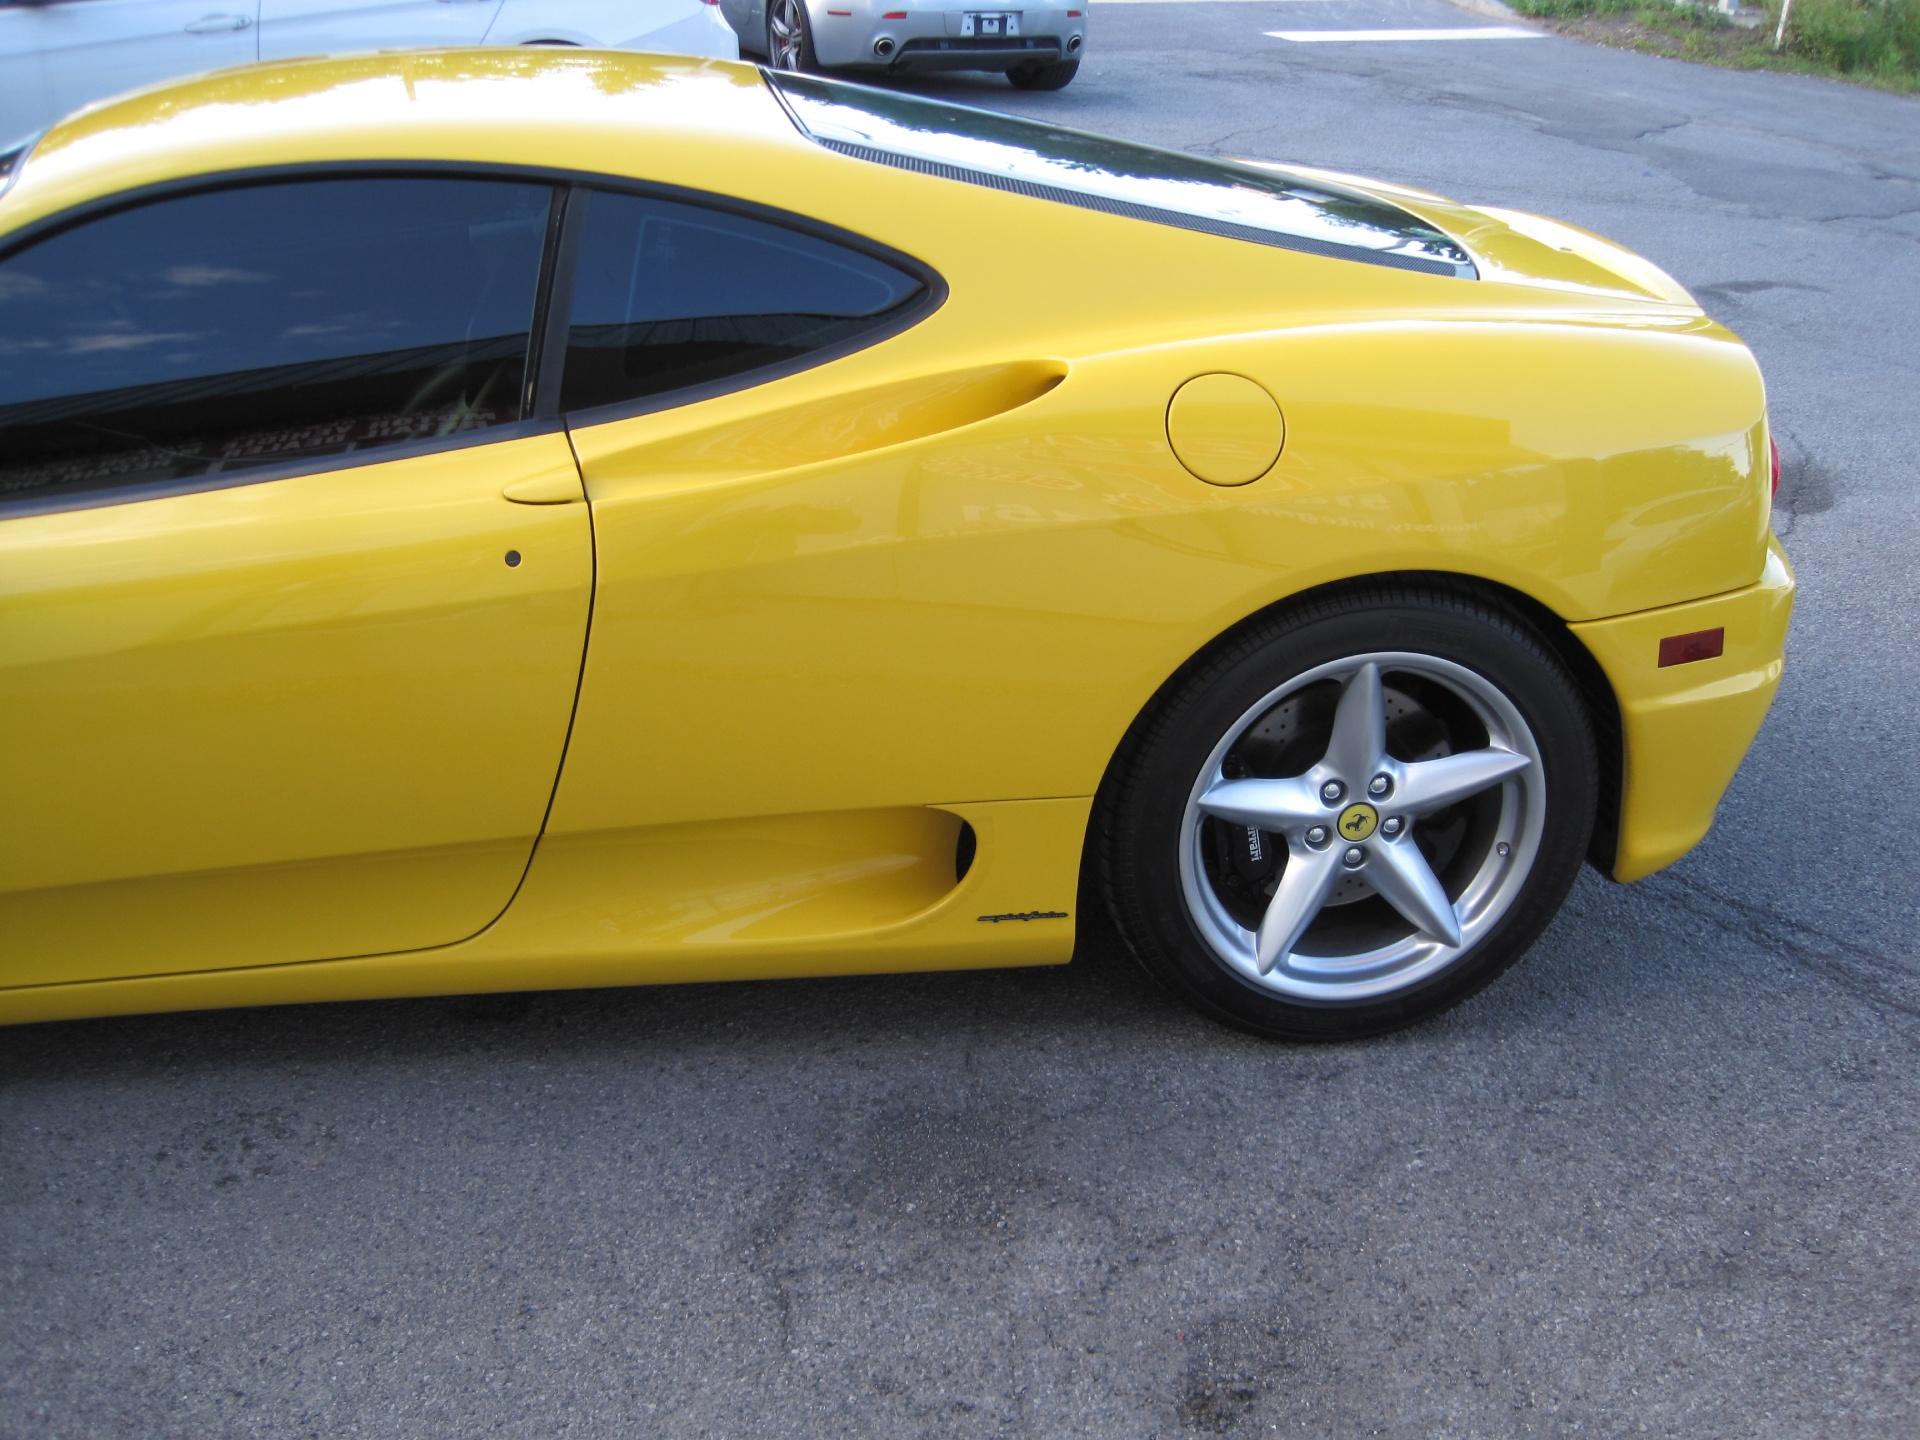 Used 2003 Ferrari 360 Modena RARE 6 SPEED MANUAL COUPE,SUPERB CONDITION,SUPER NICE | Albany, NY